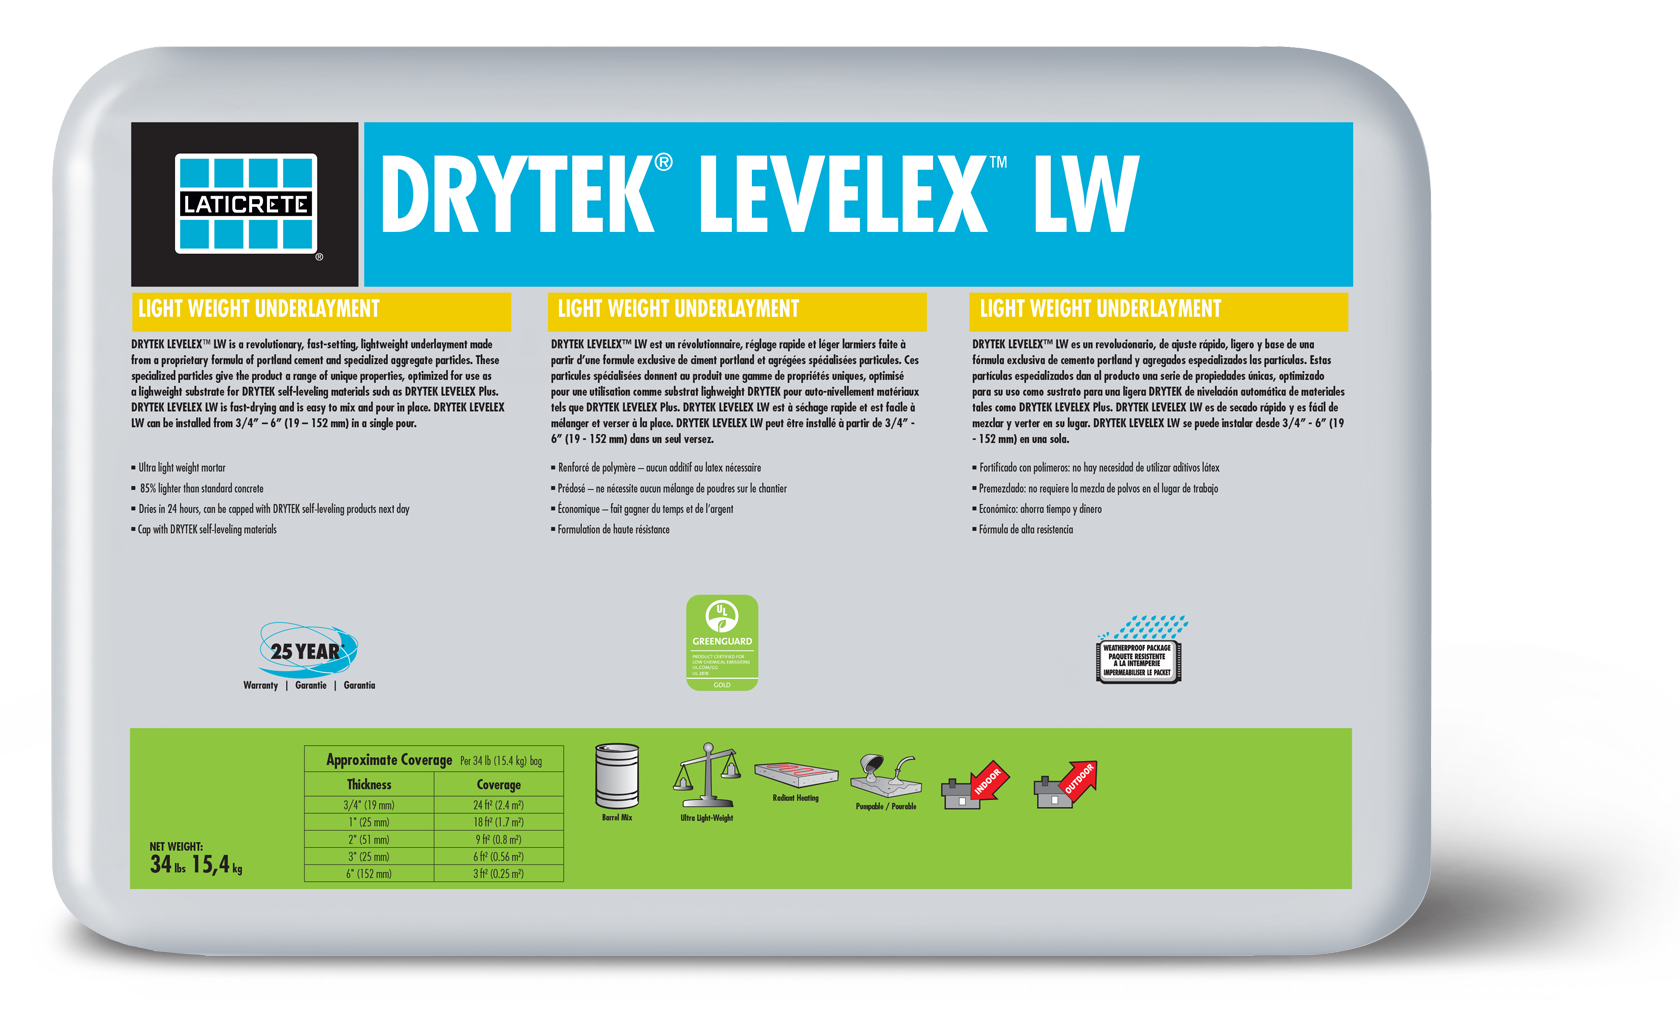 DRYTEK® LEVELEX™ LW